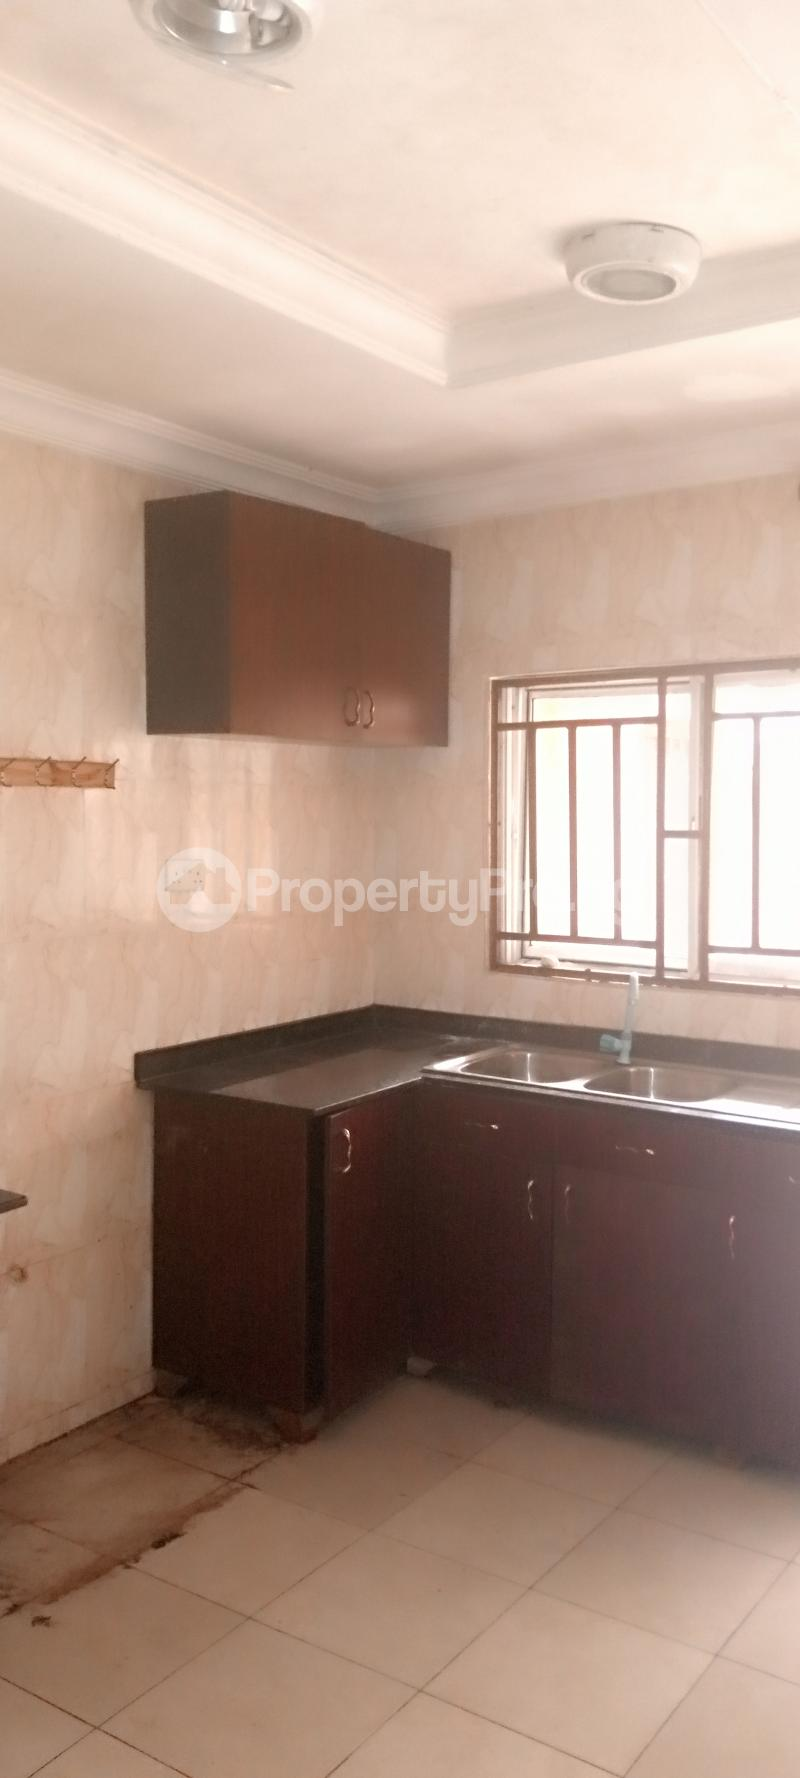 5 bedroom House for rent Estate drive Omole phase 2 Ojodu Lagos - 9